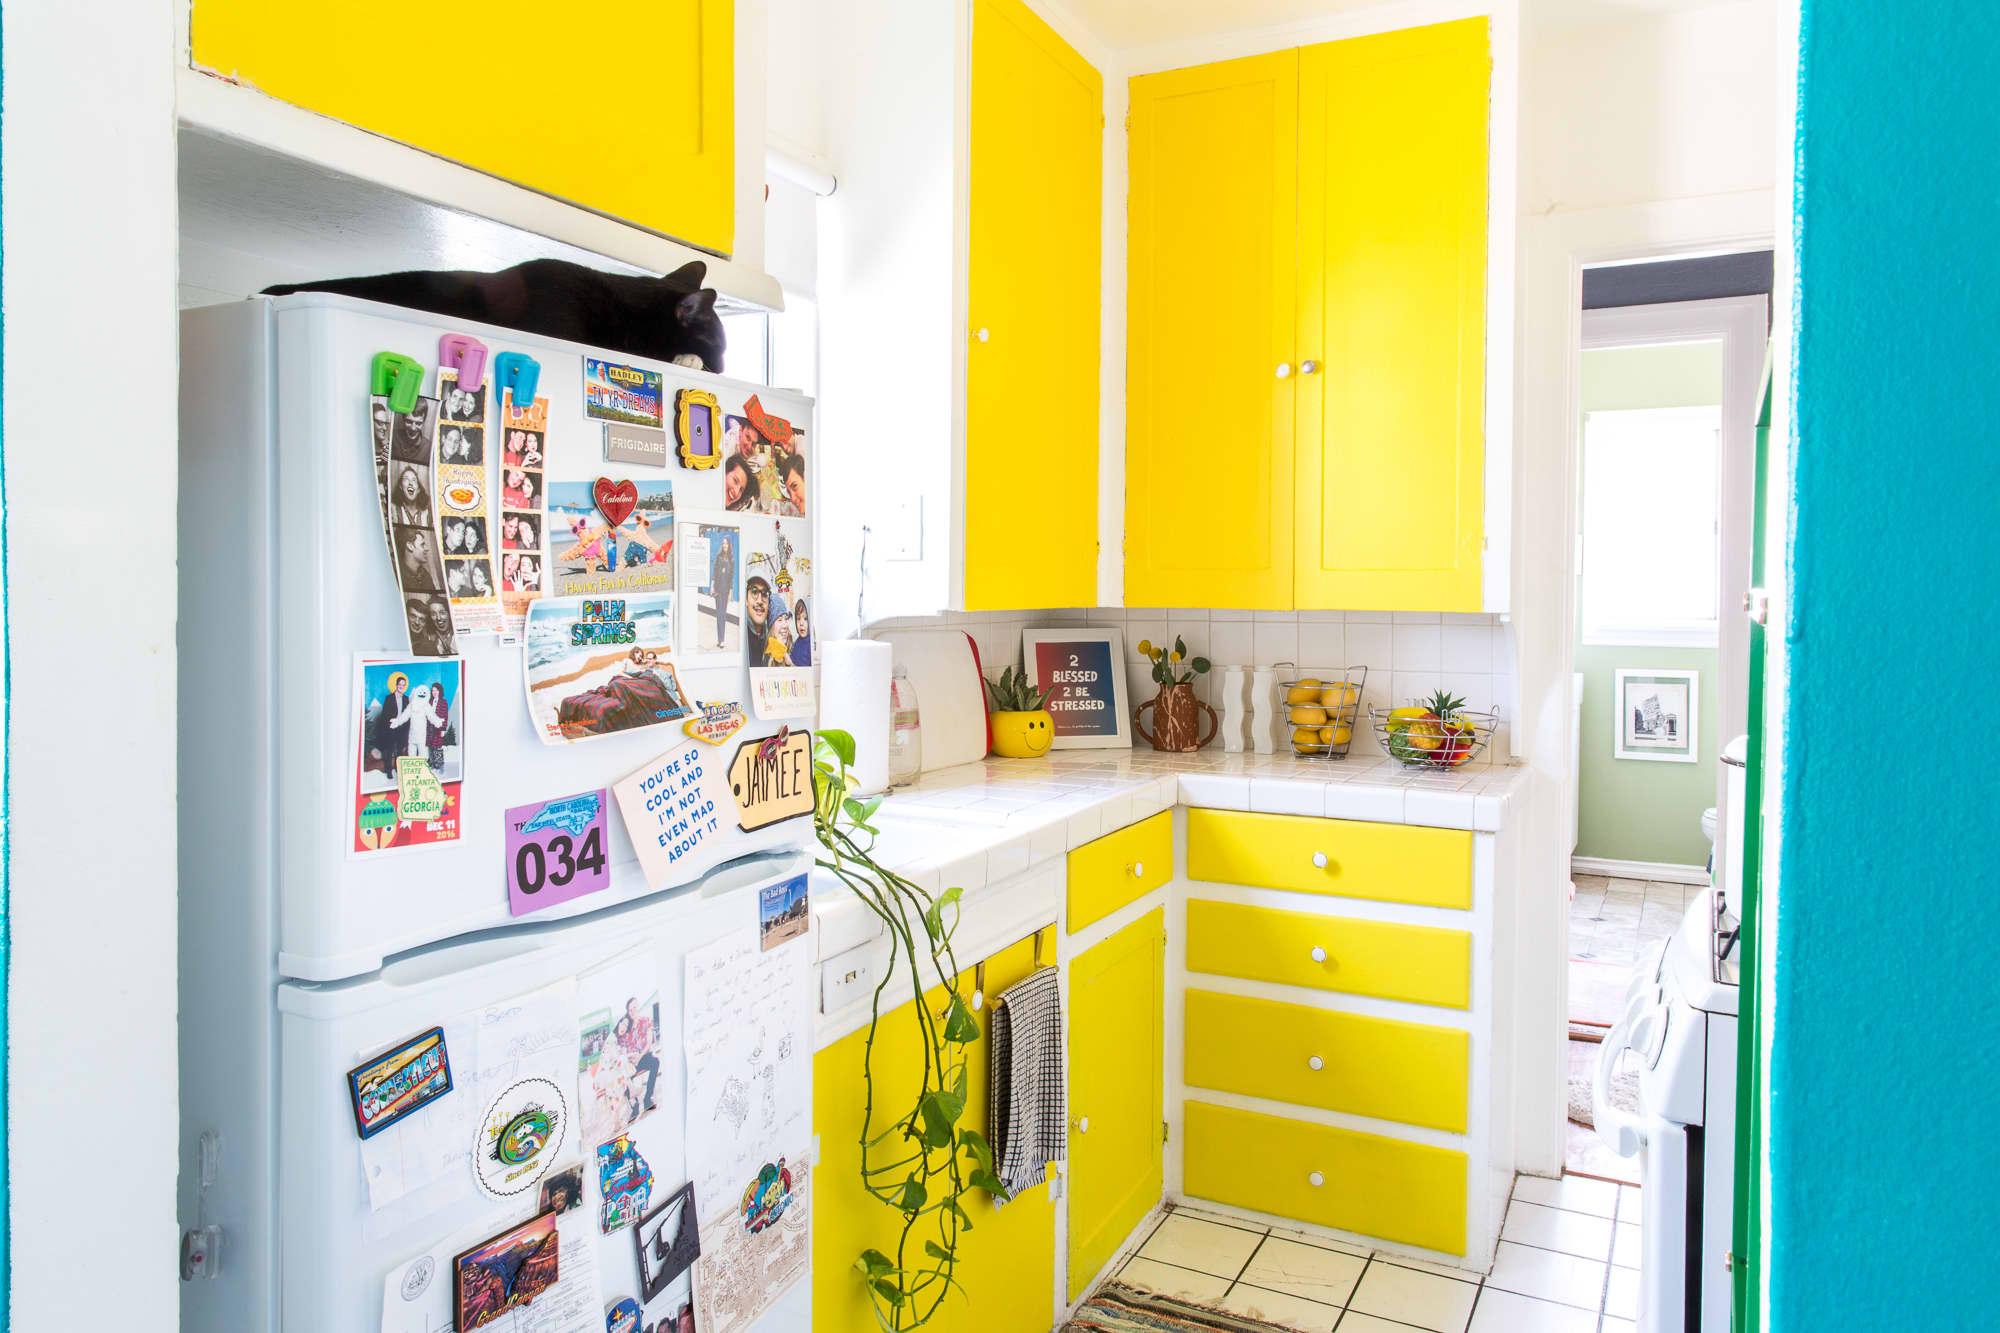 Best Small Kitchen Design Ideas - Smart Small Kitchen ...